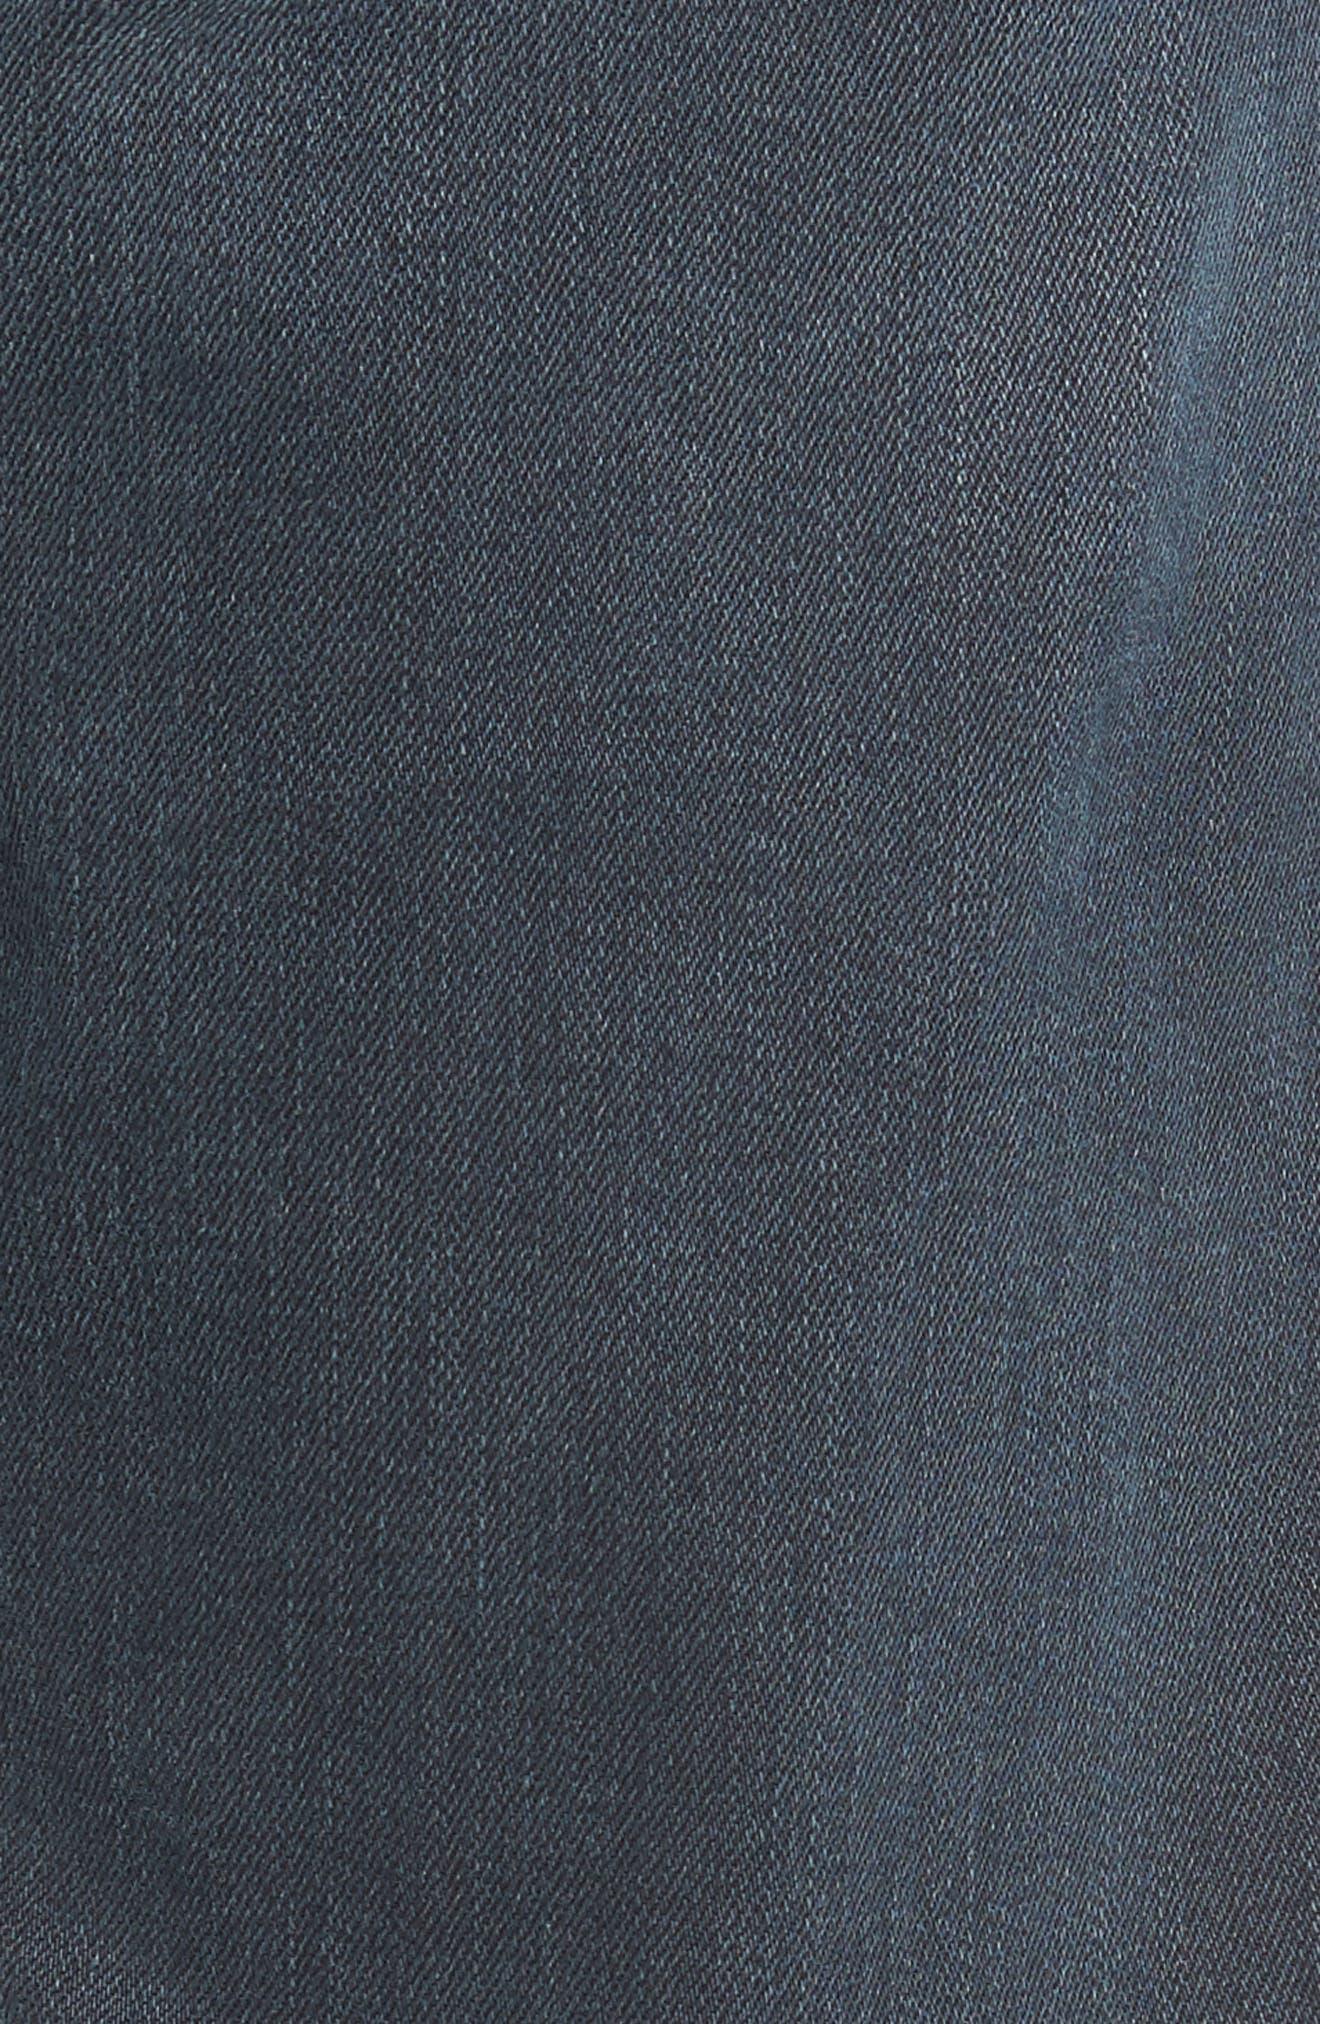 RAG & BONE, Fit 2 Slim Fit Jeans, Alternate thumbnail 6, color, MINNA